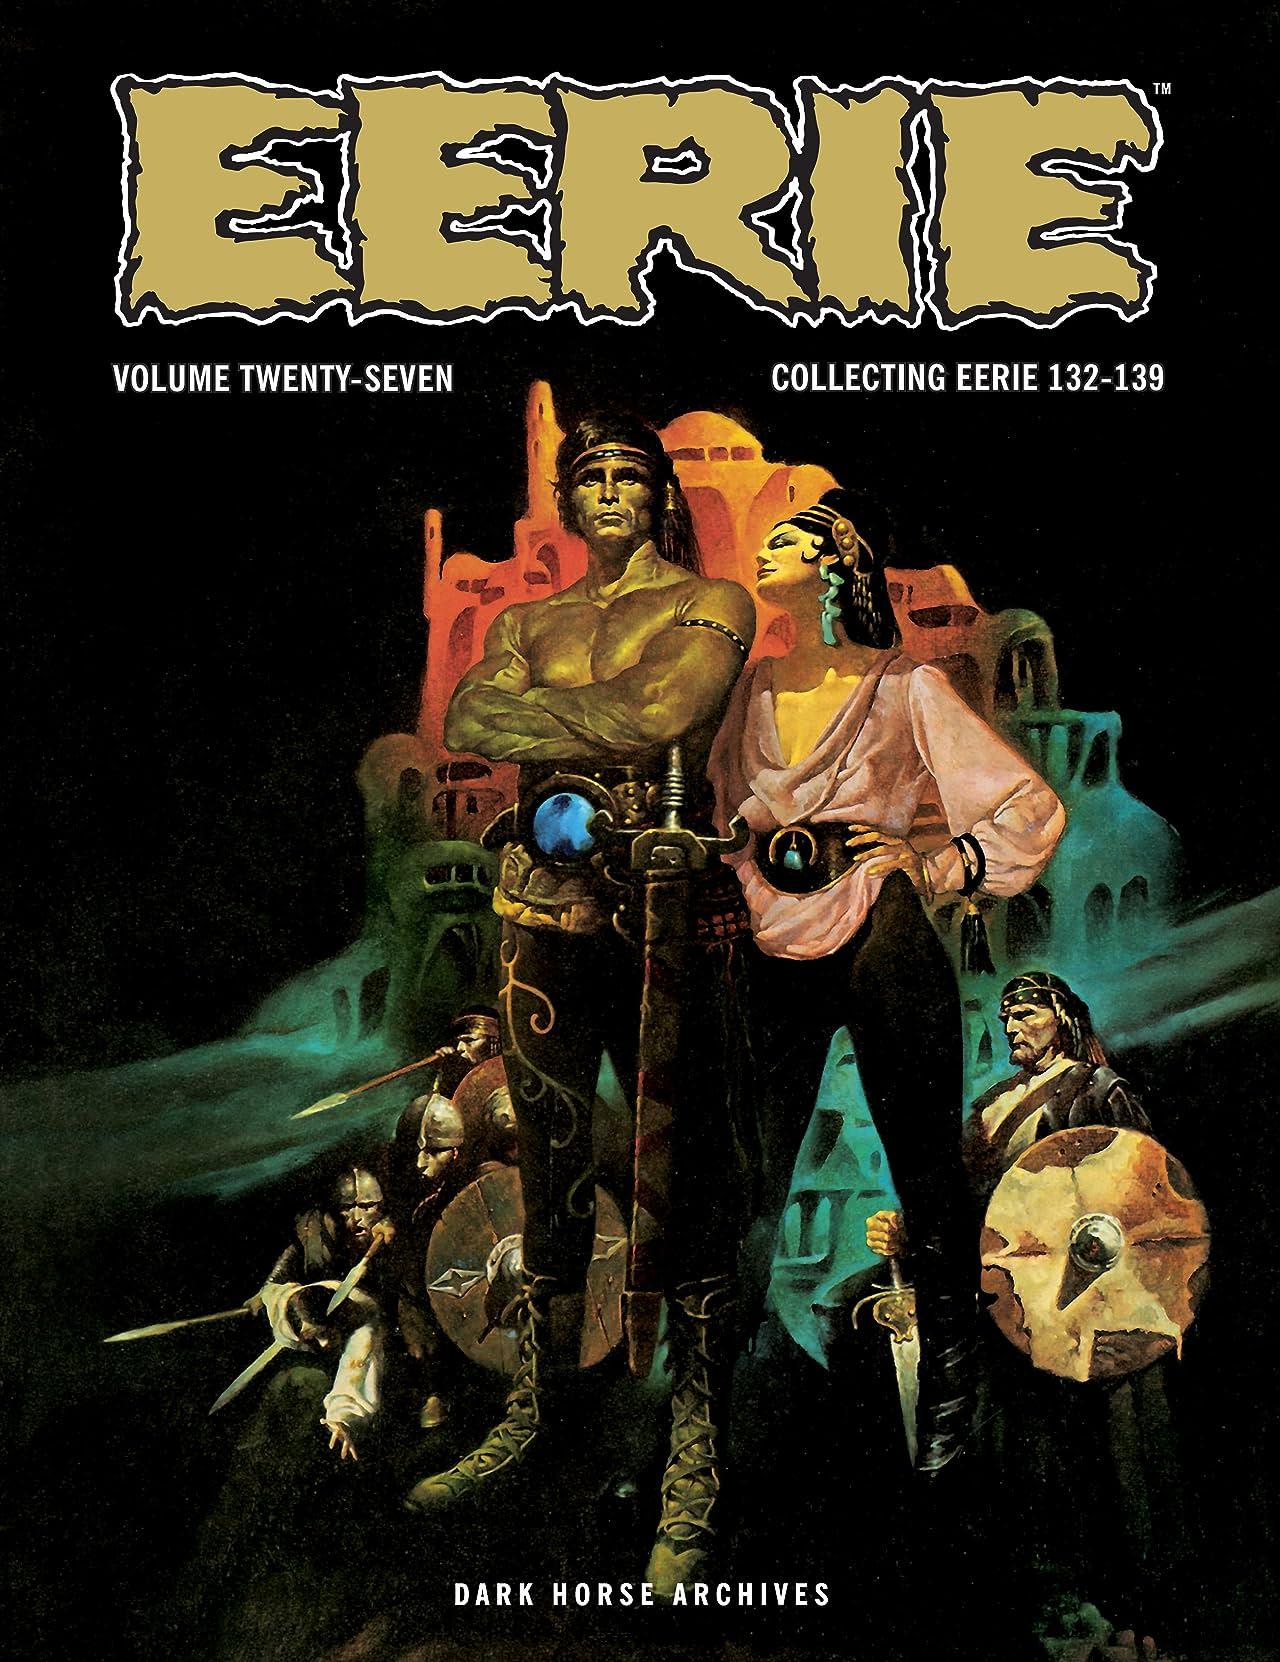 Eerie Archives Vol. 27